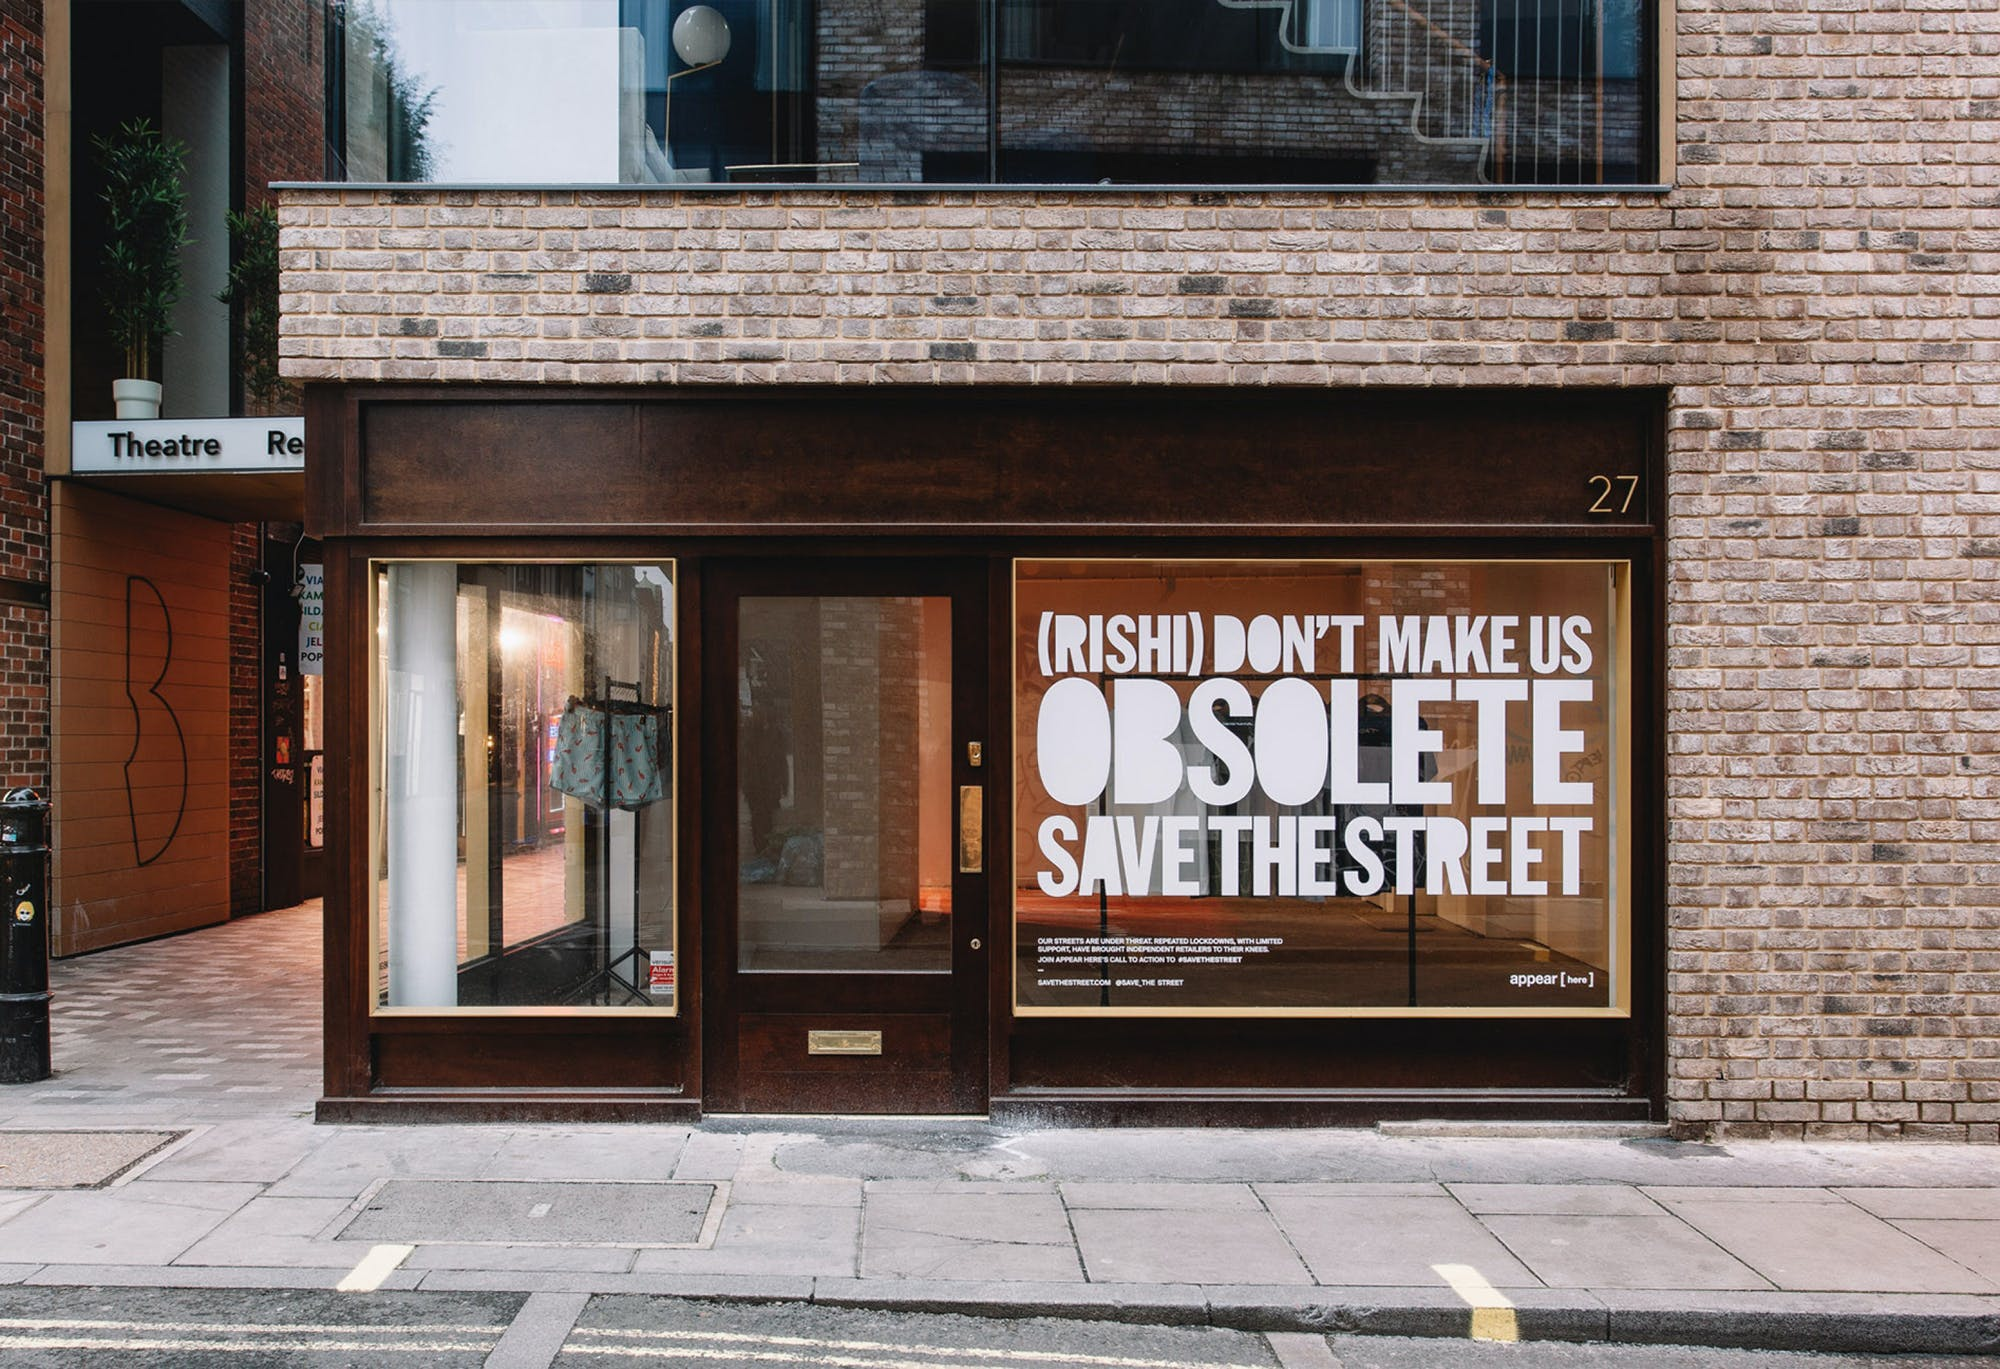 #SAVETHESTREET Charlotte Tilbury joins the #SAVETHESTREET campaign